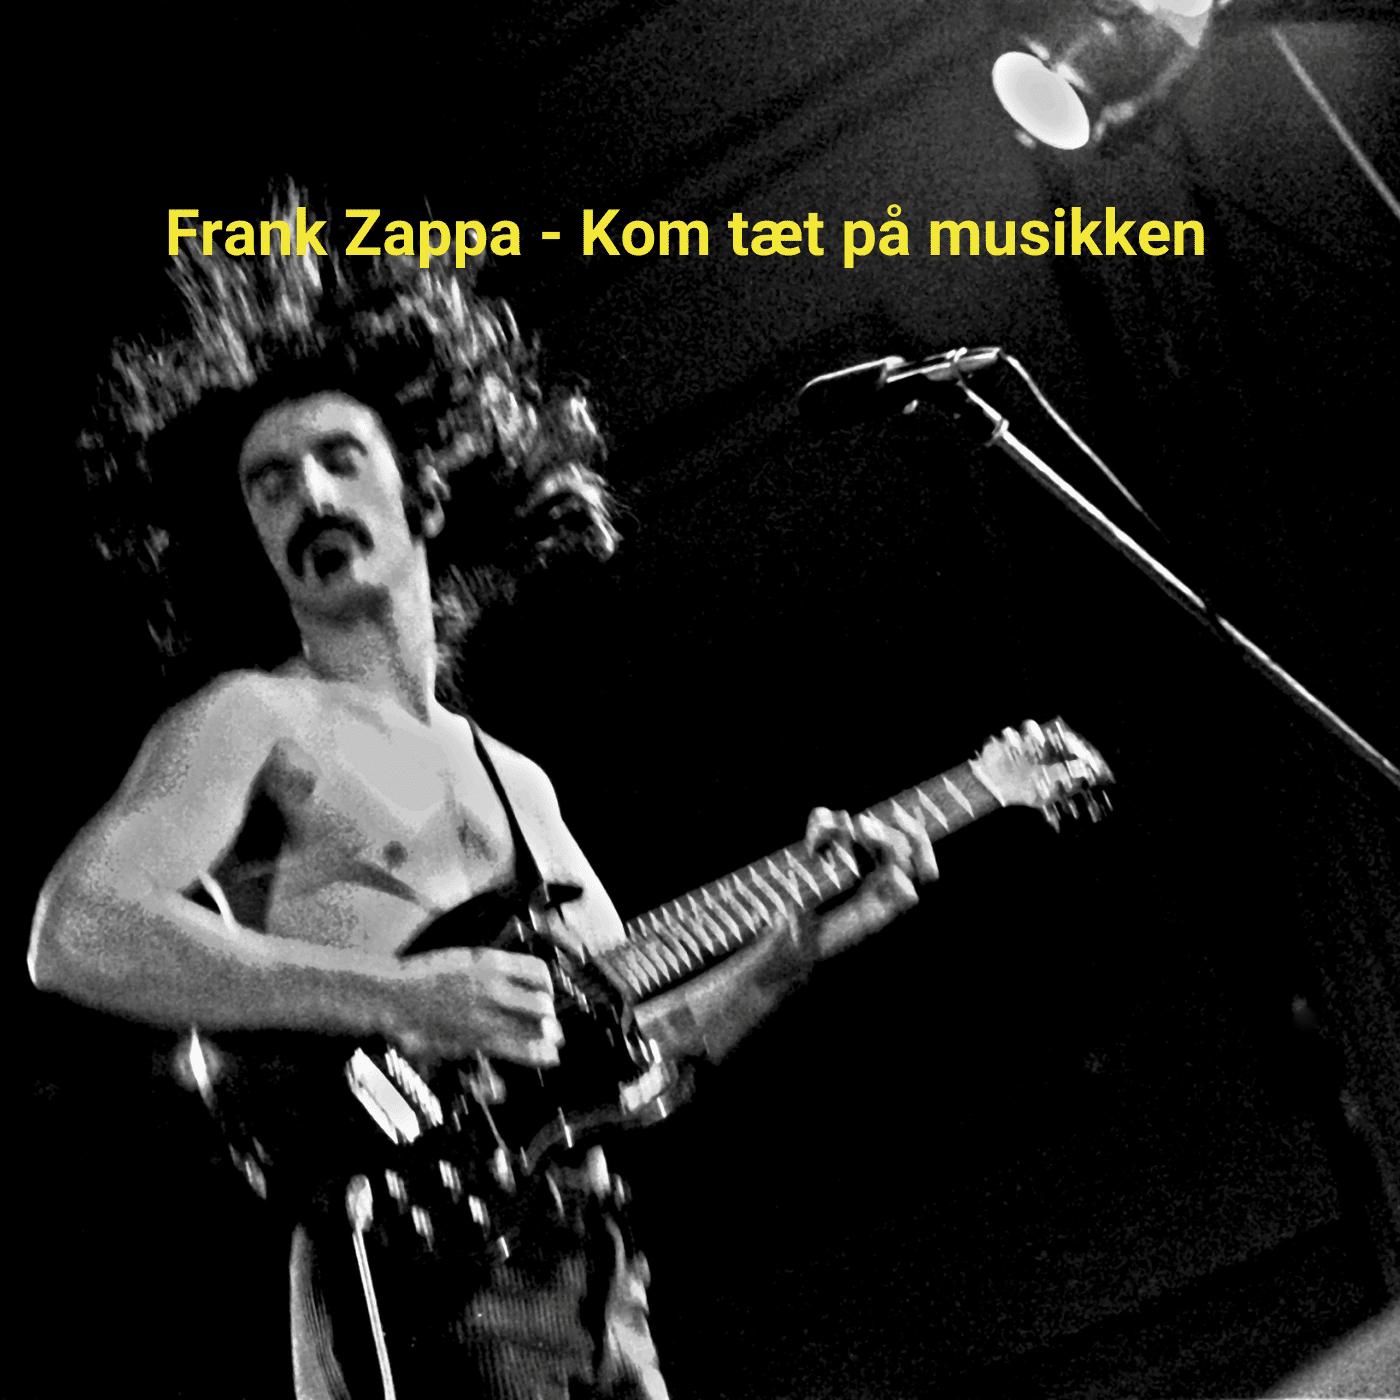 Podcast om Frank Zappa - Per Wium